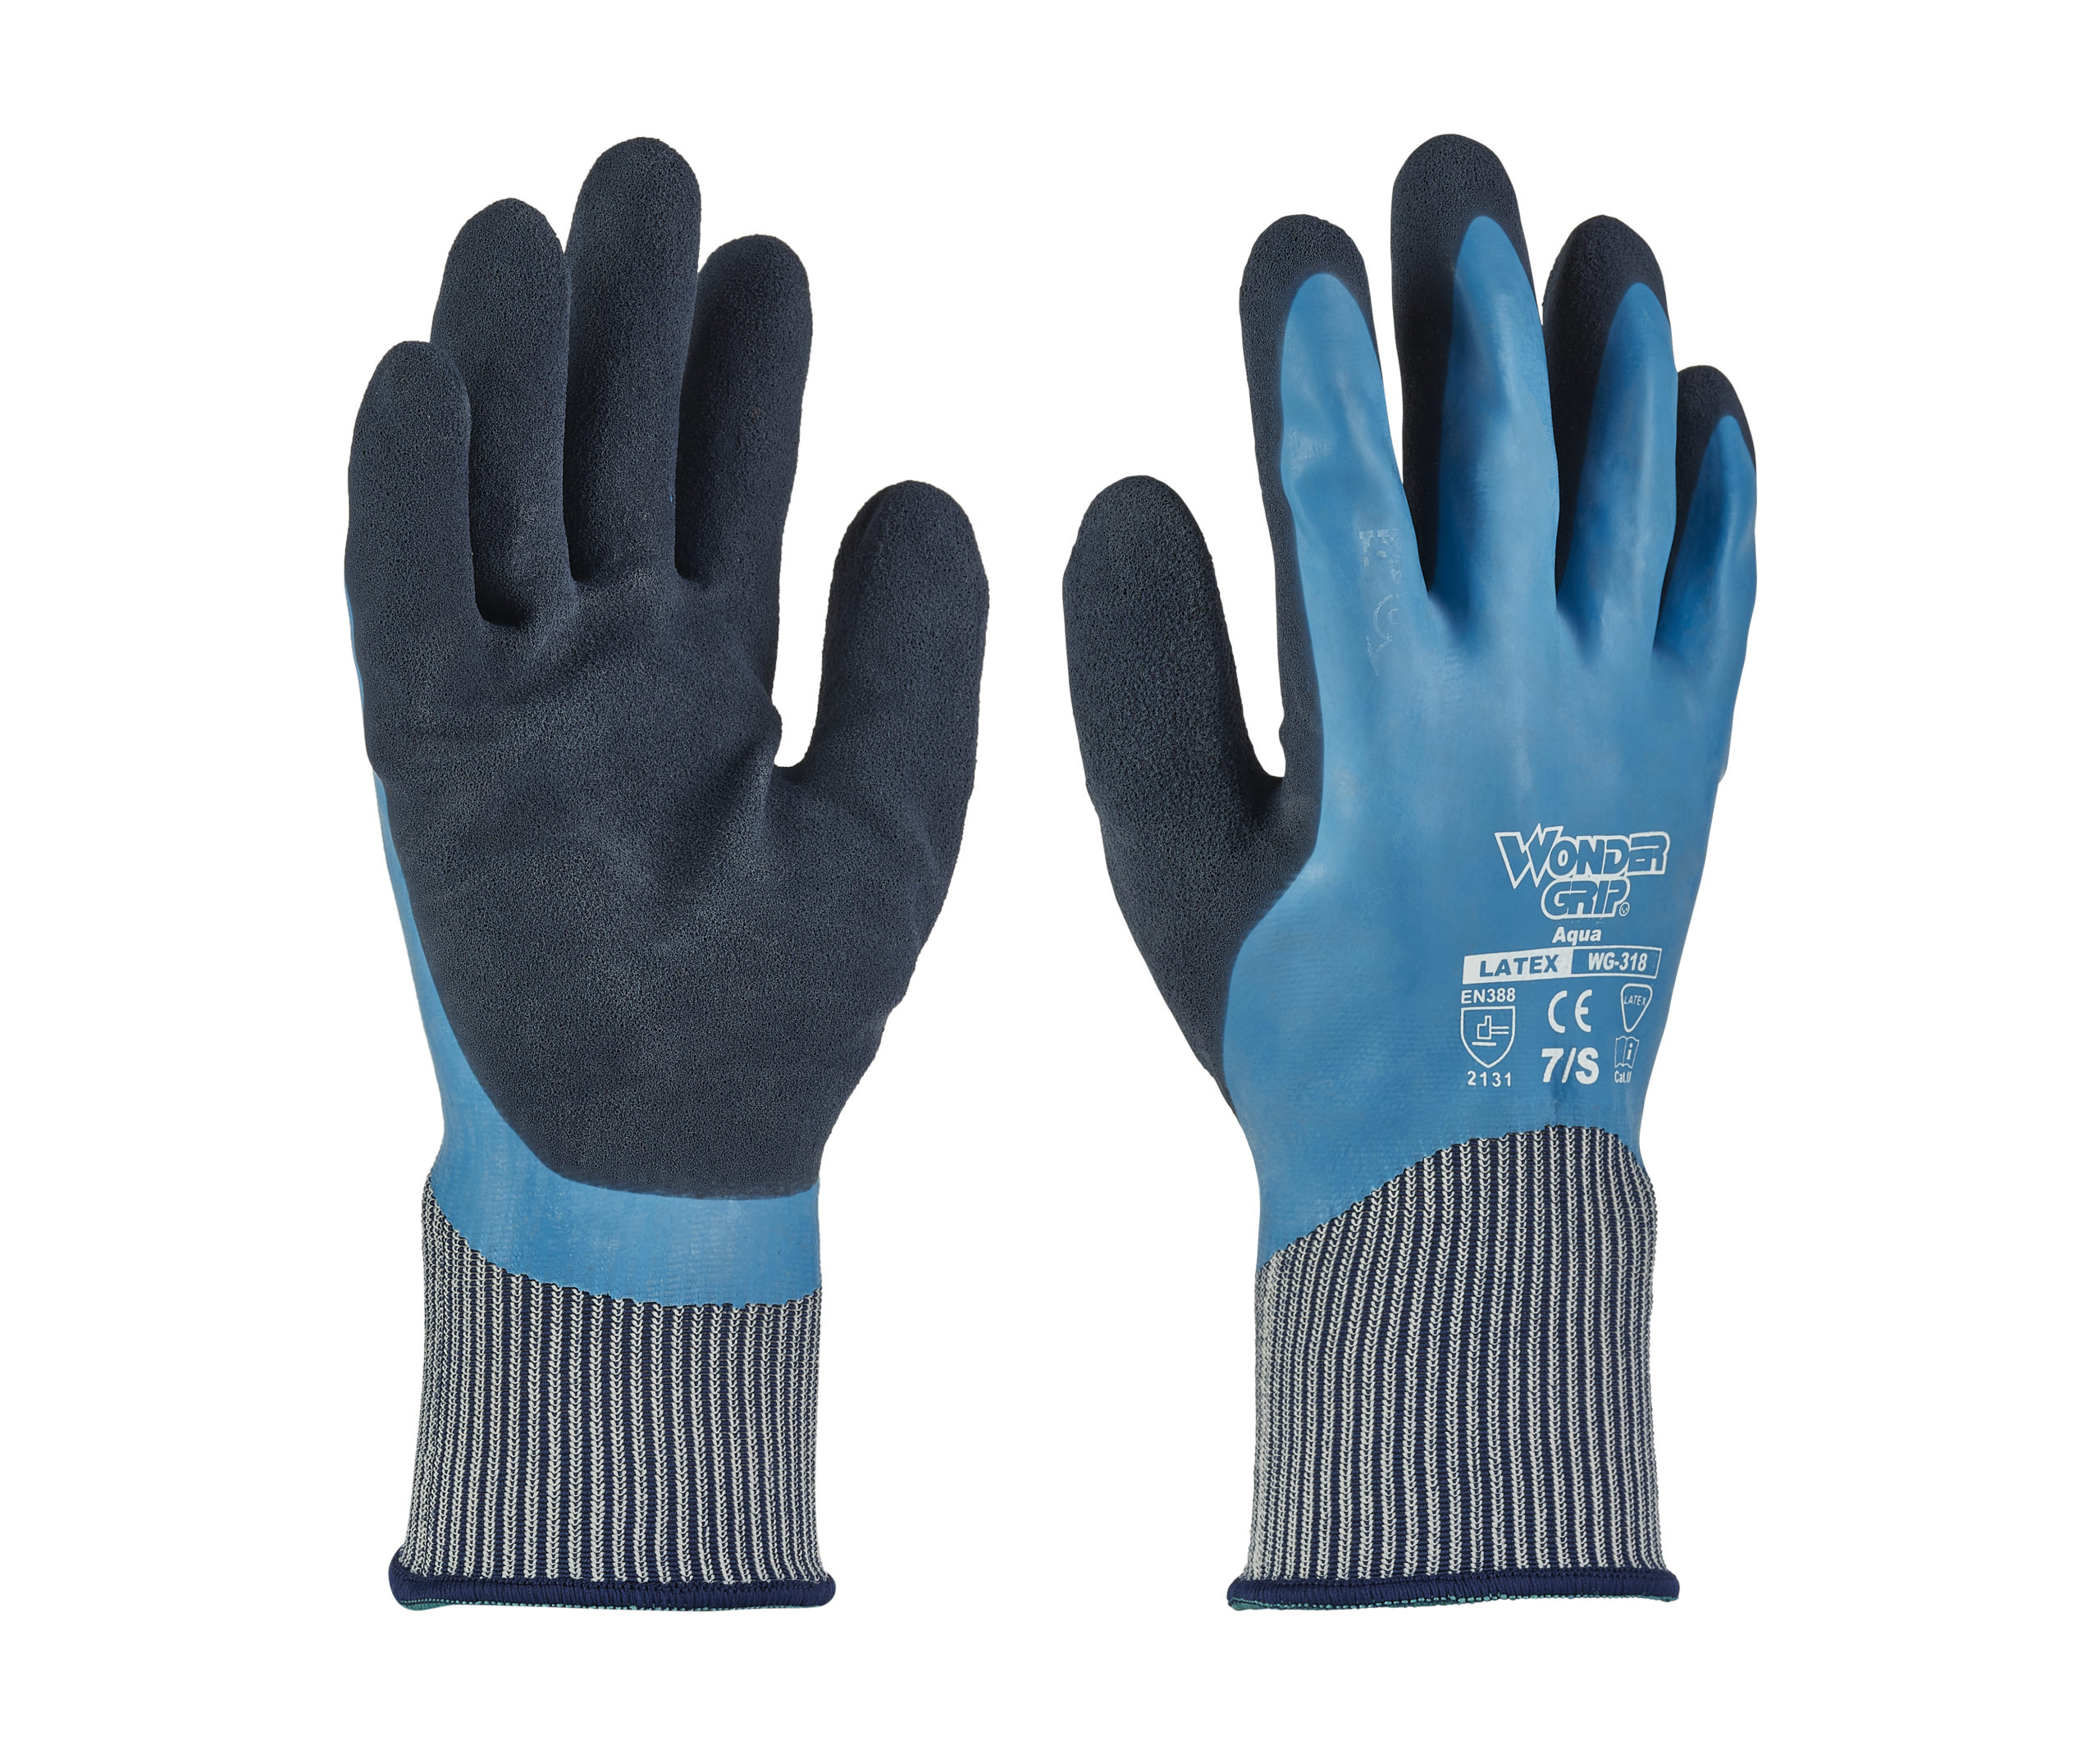 Wonder Grip Waterproof Gloves Aqua Latex Fully Coated Nylon Blue WG-318